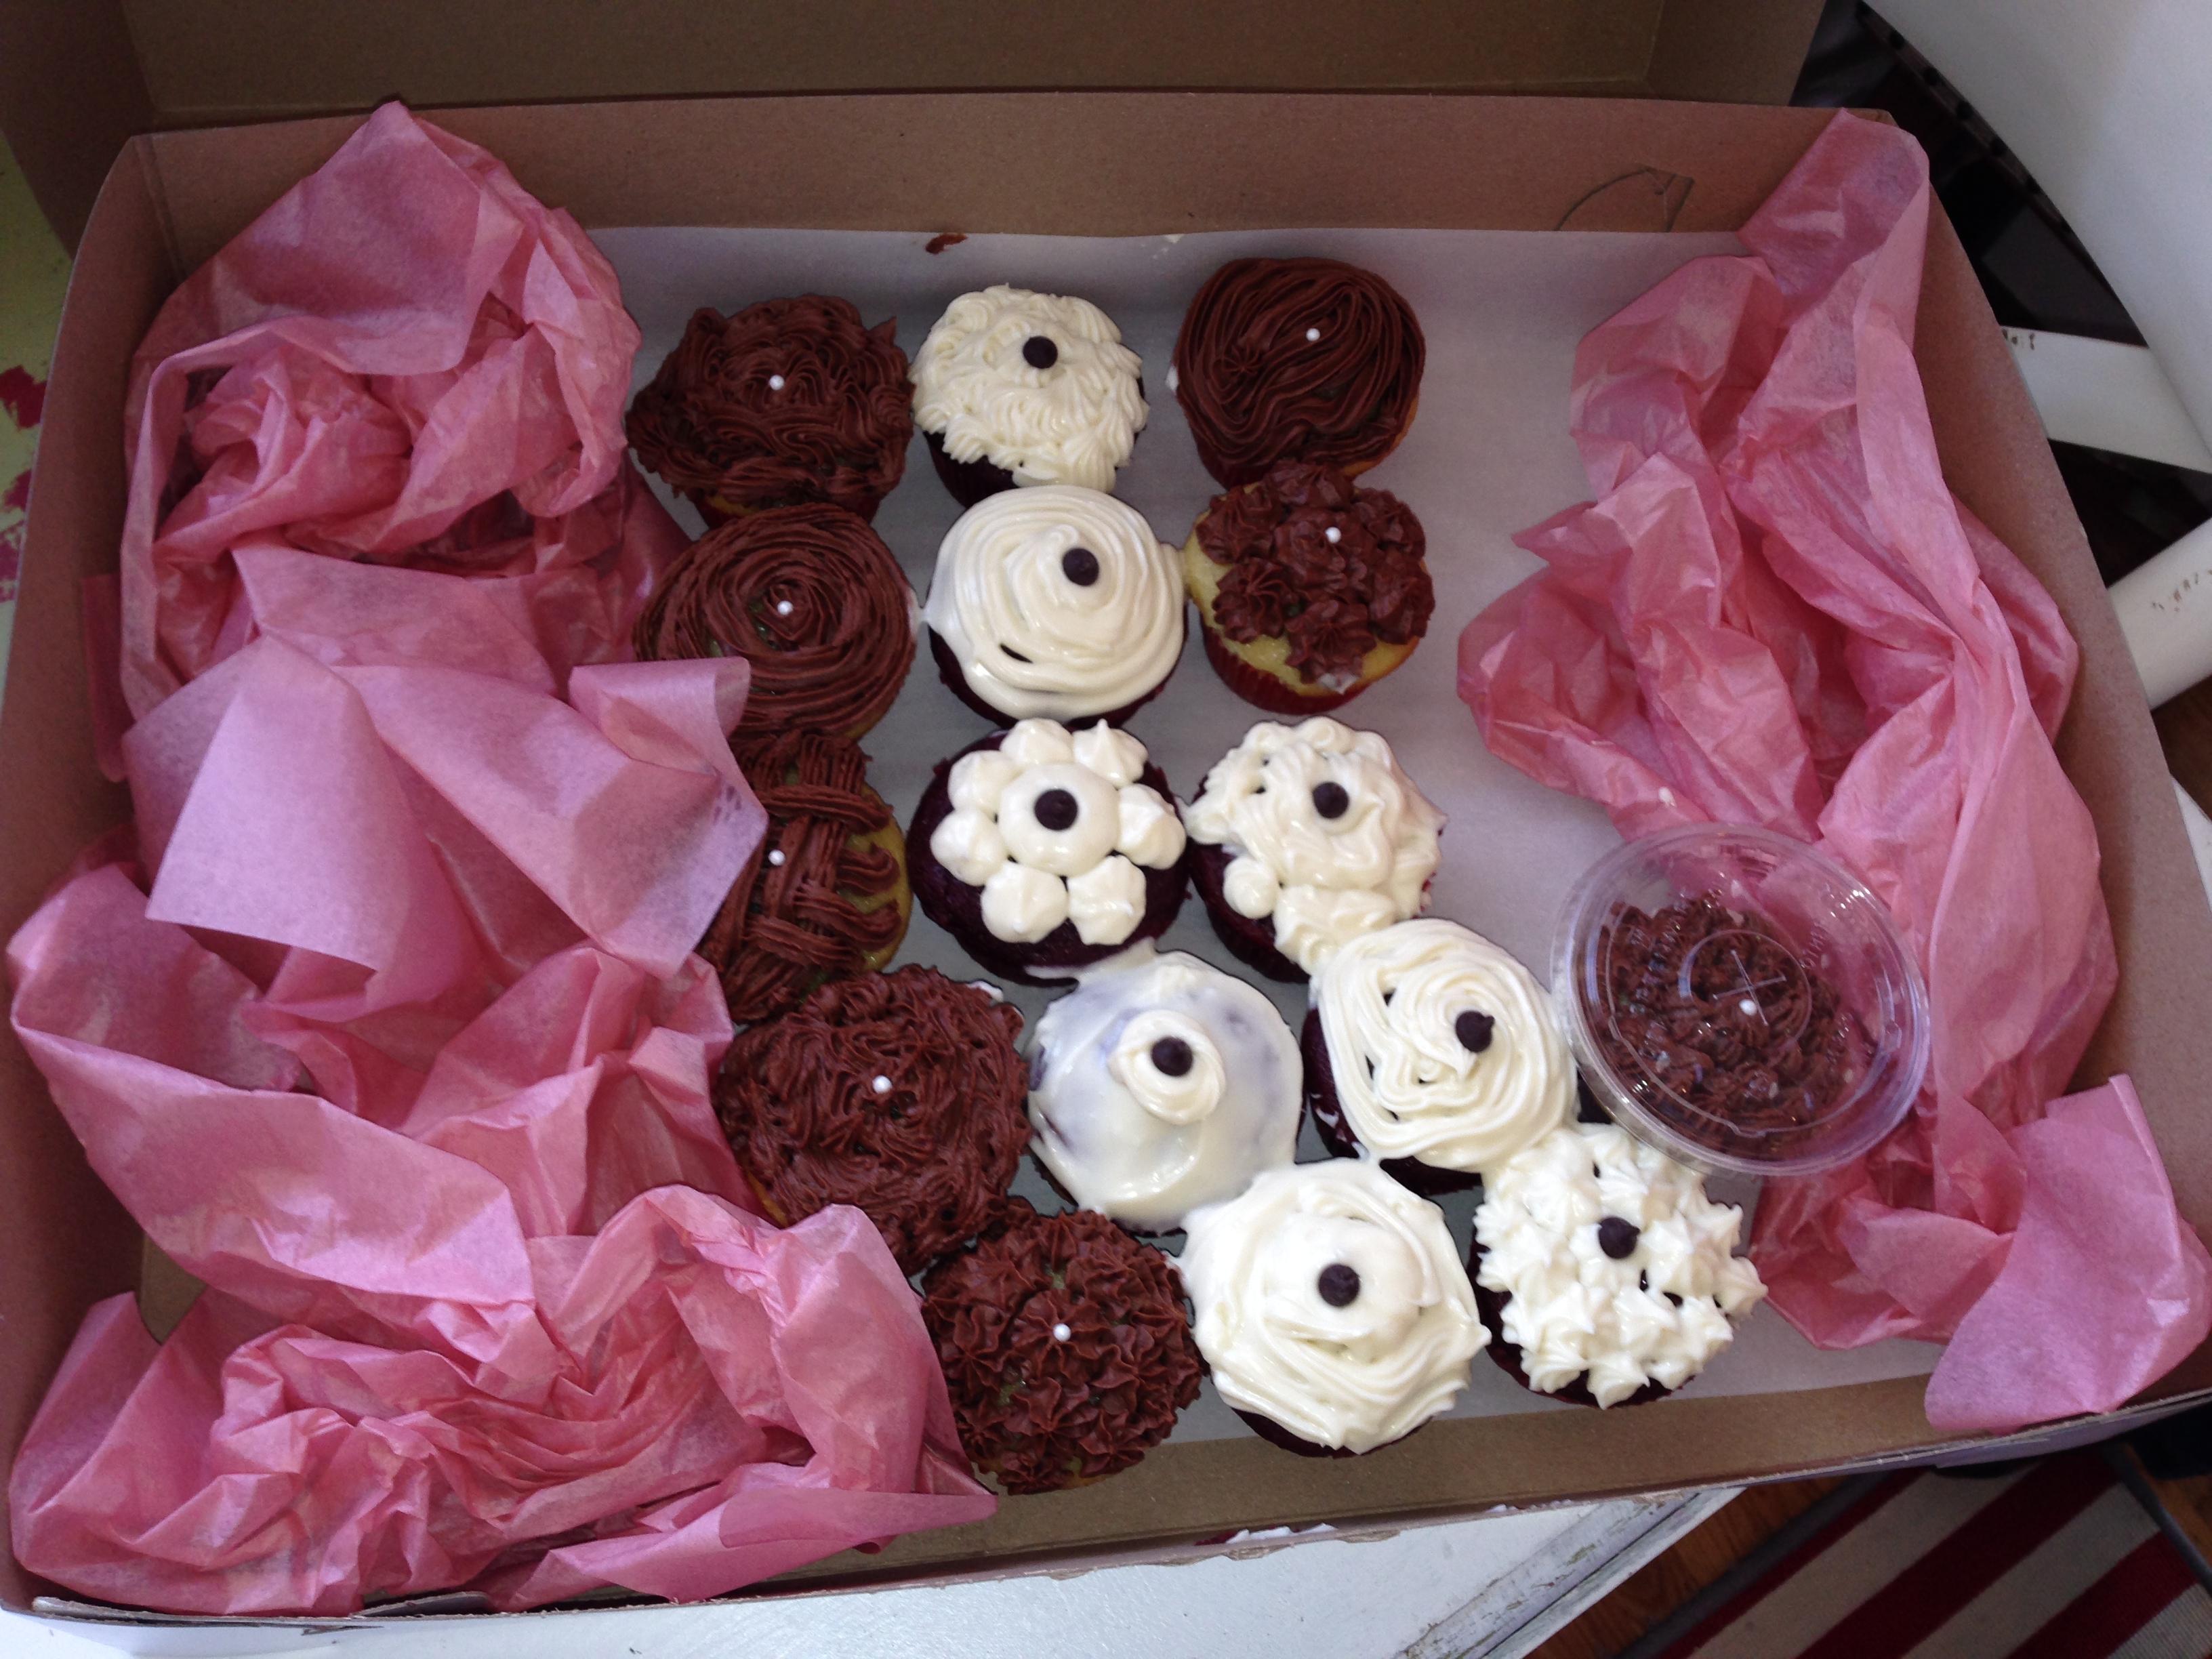 Birthday Cake Delivery Petaluma